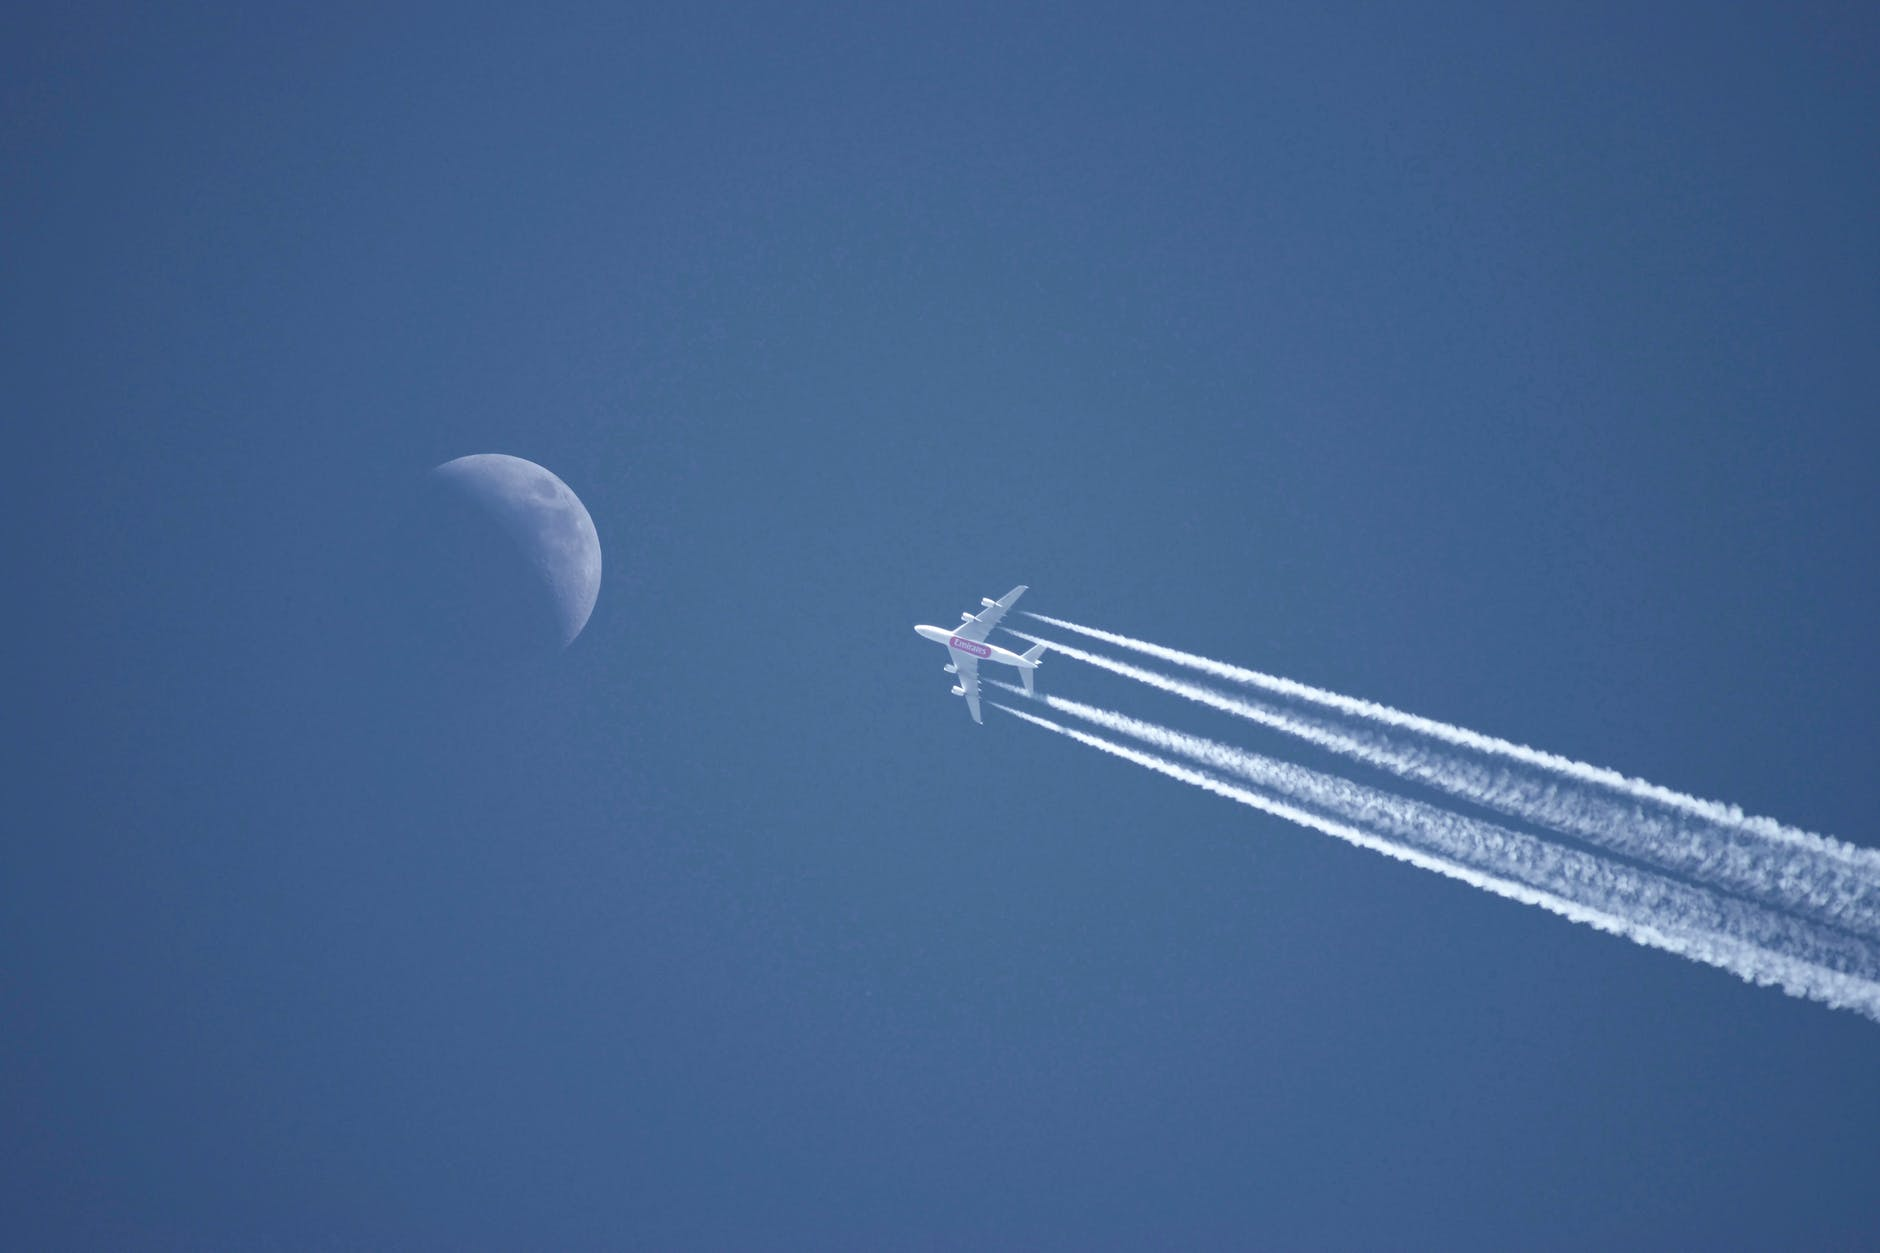 white plane on the sky